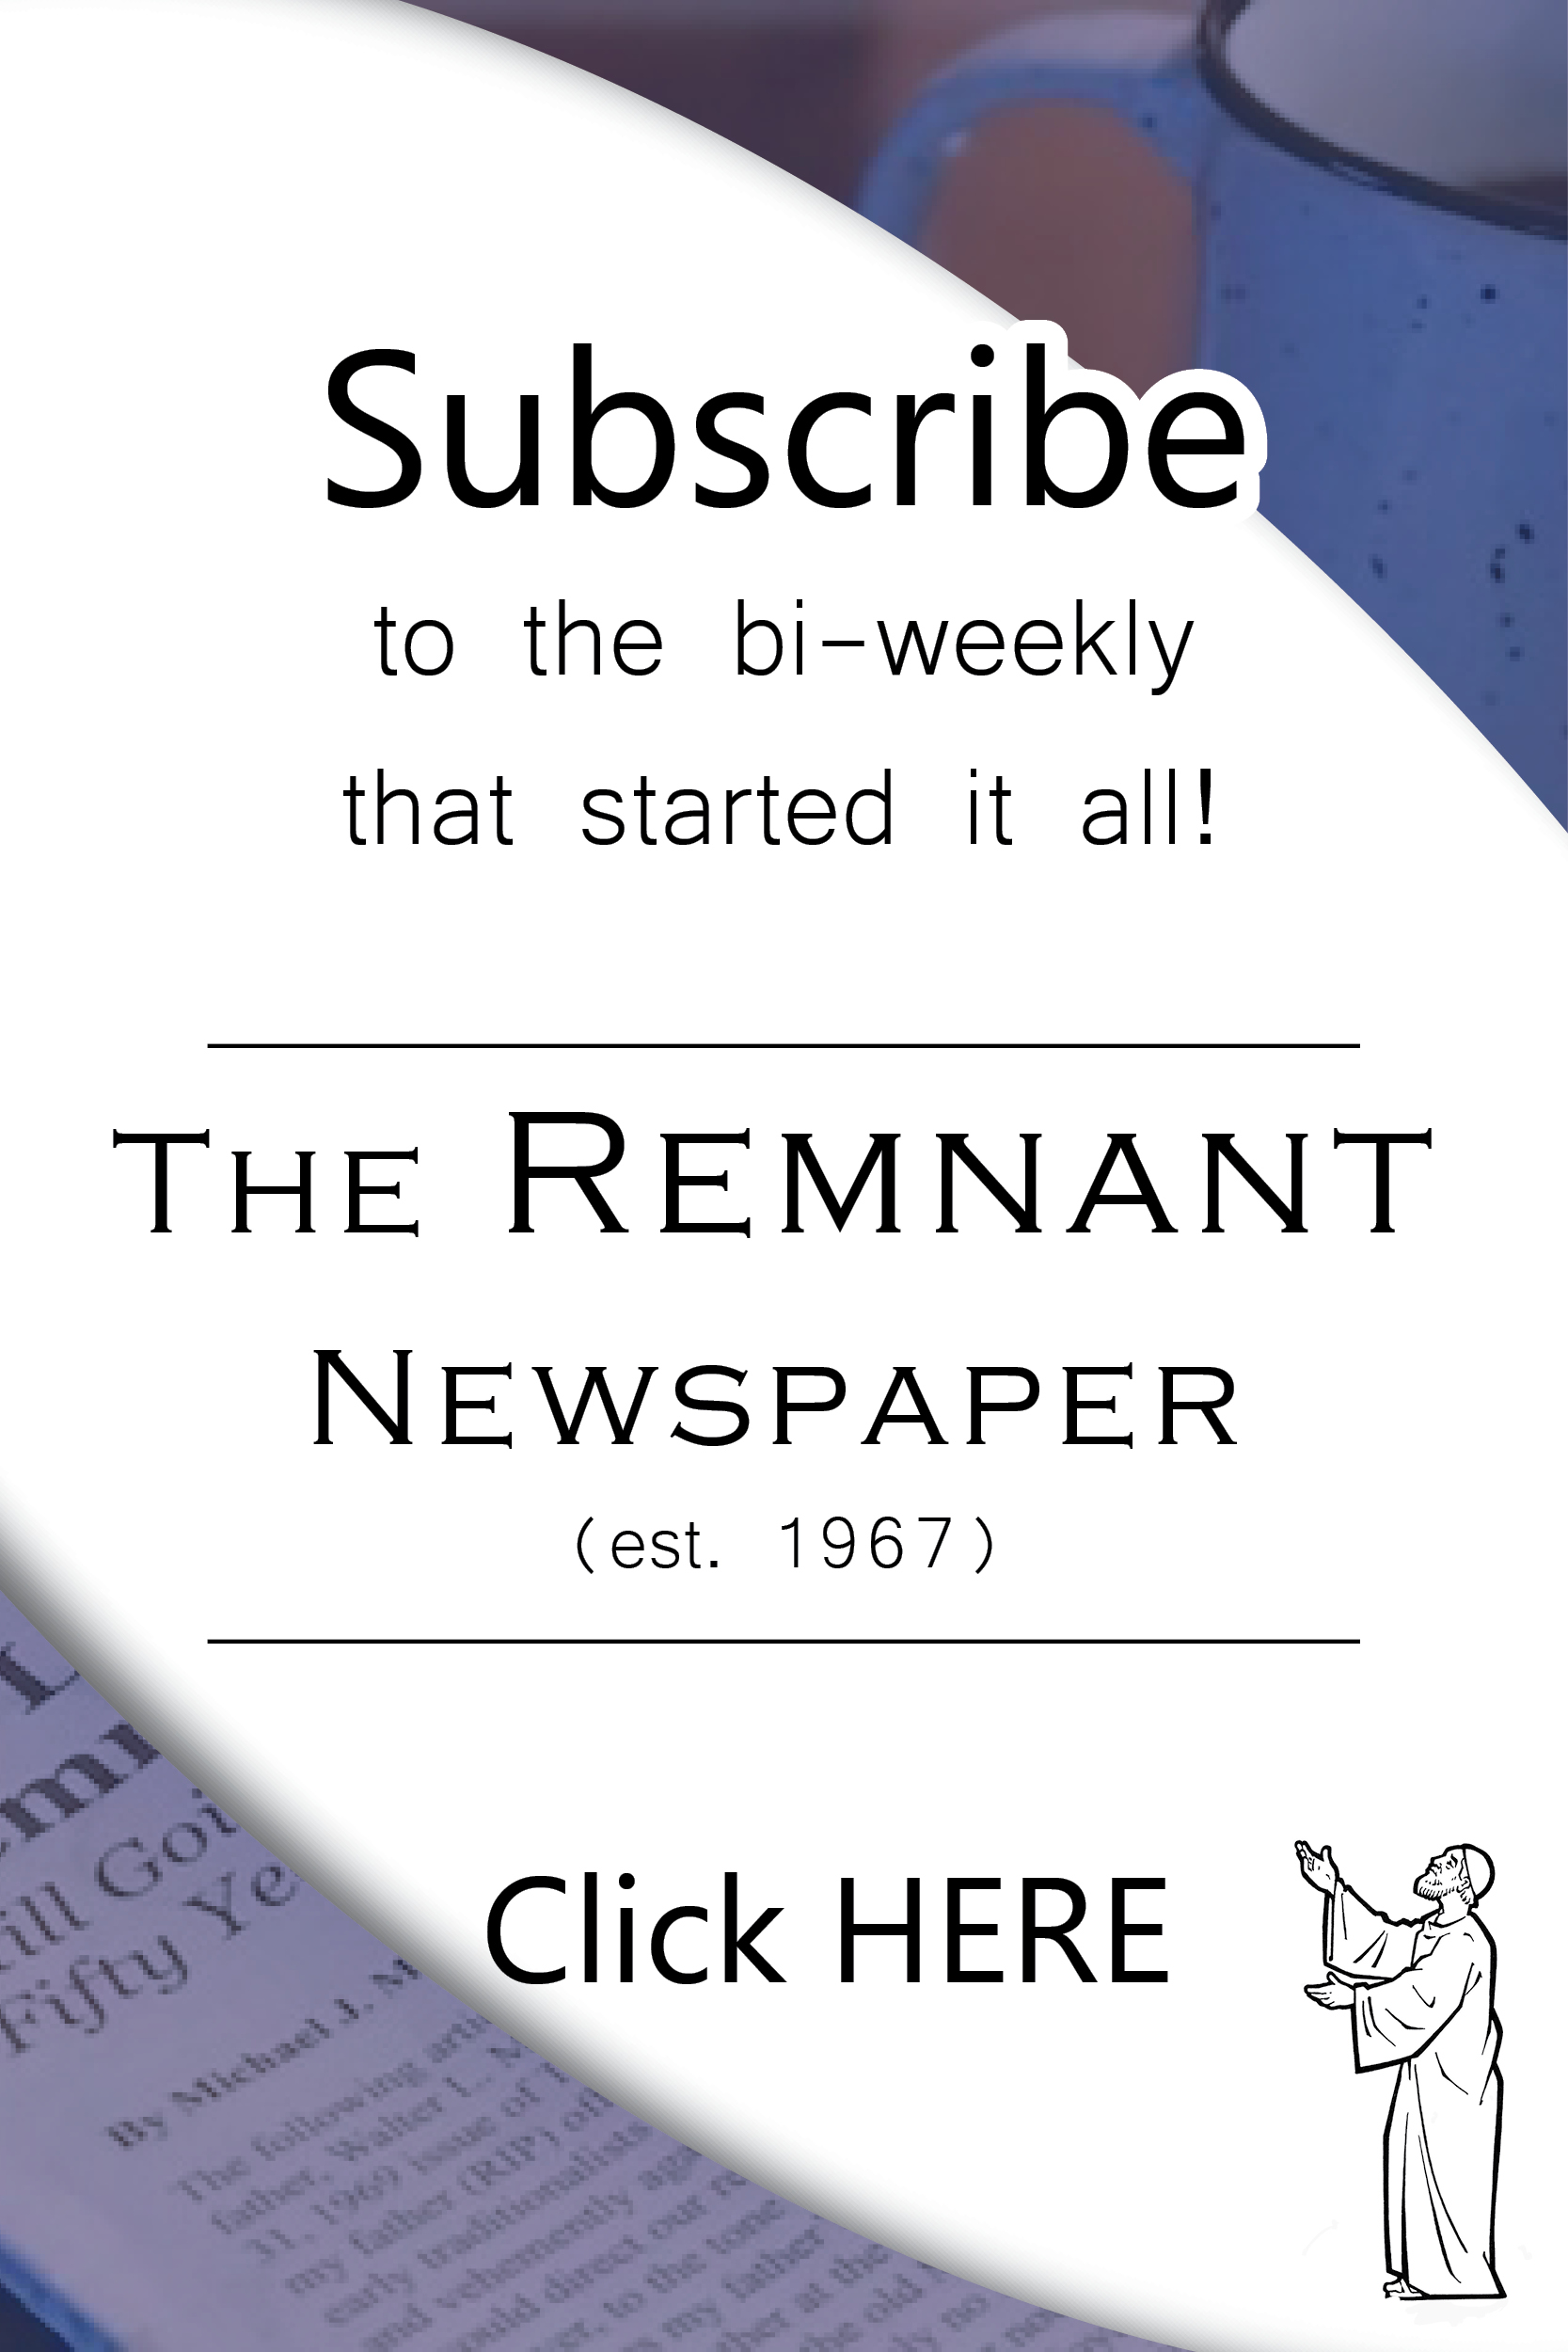 new subscription ad